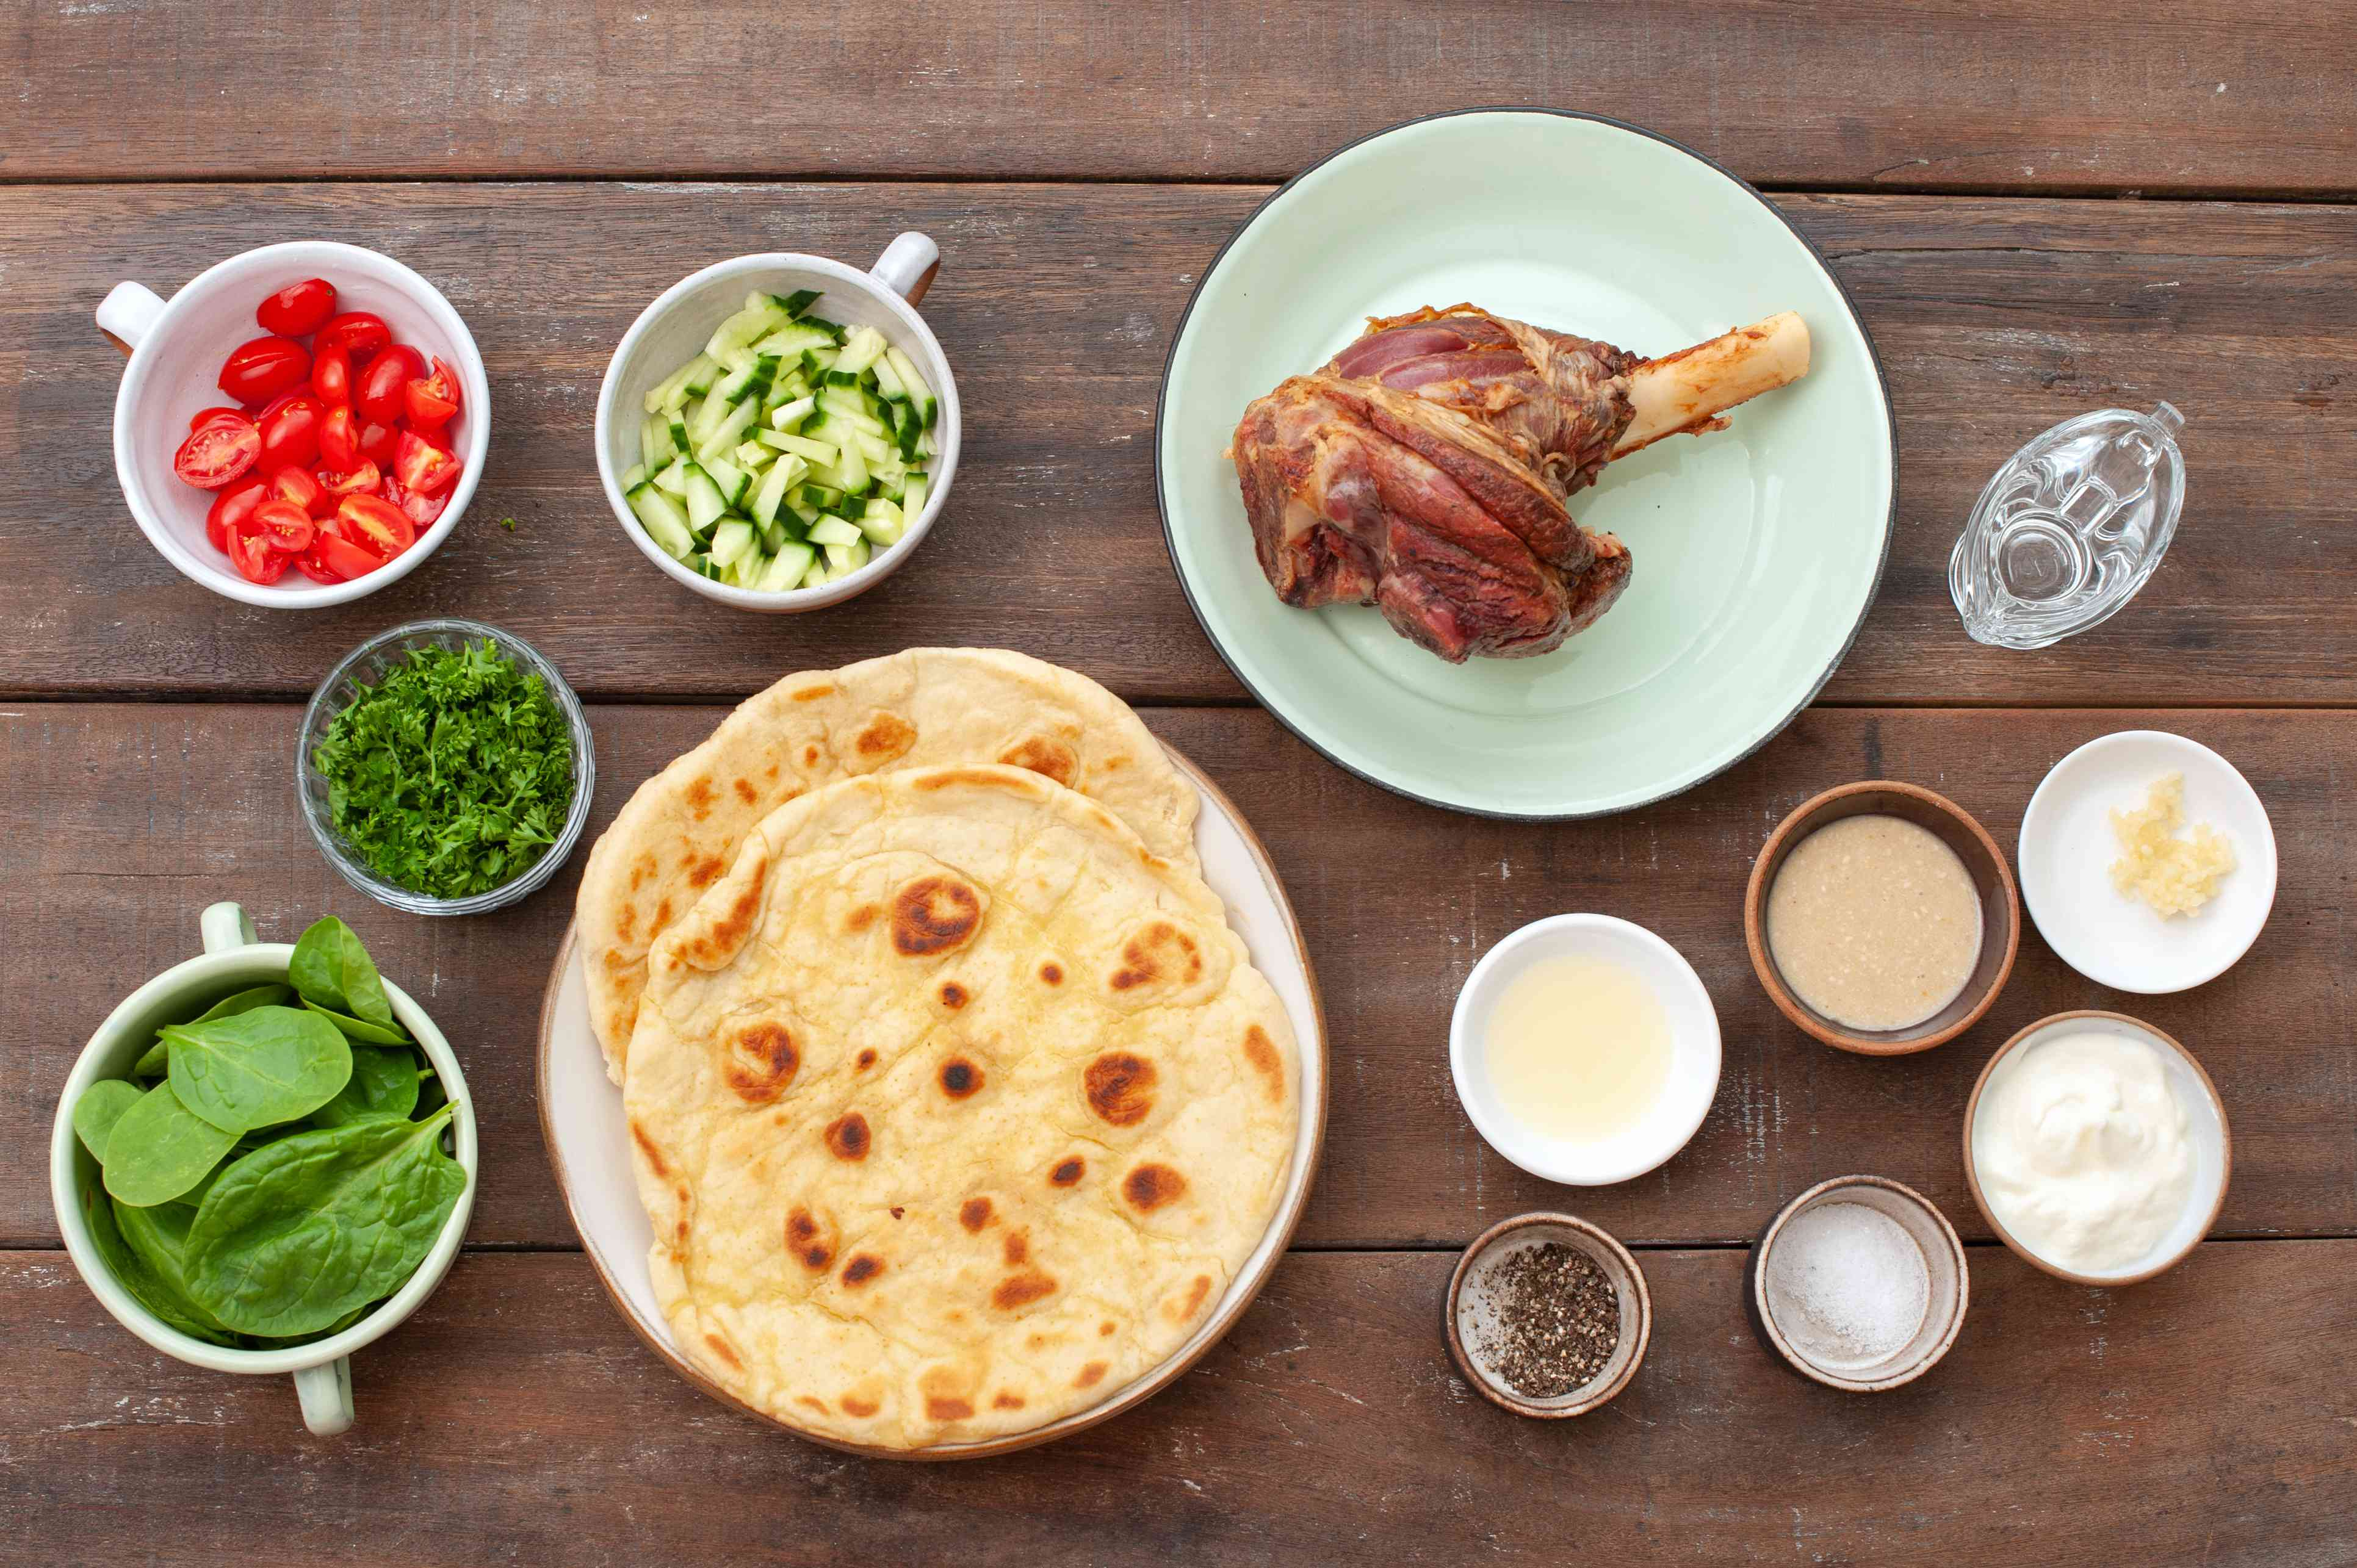 Ingredients for lamb sandwich